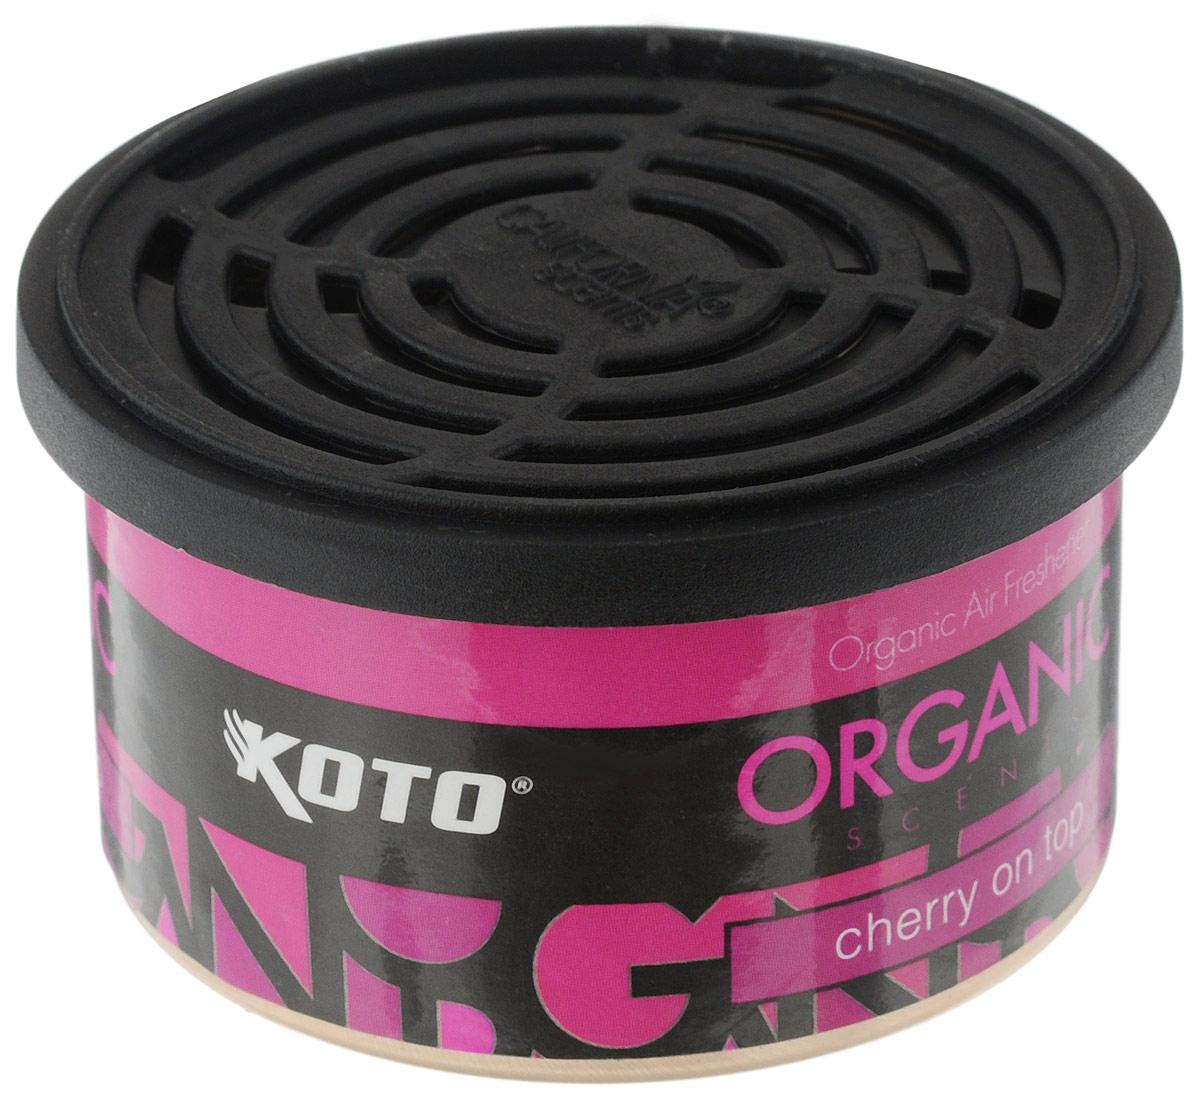 Ароматизатор автомобильный Koto Organic, вишня алкотестер koto bat008 0975608117